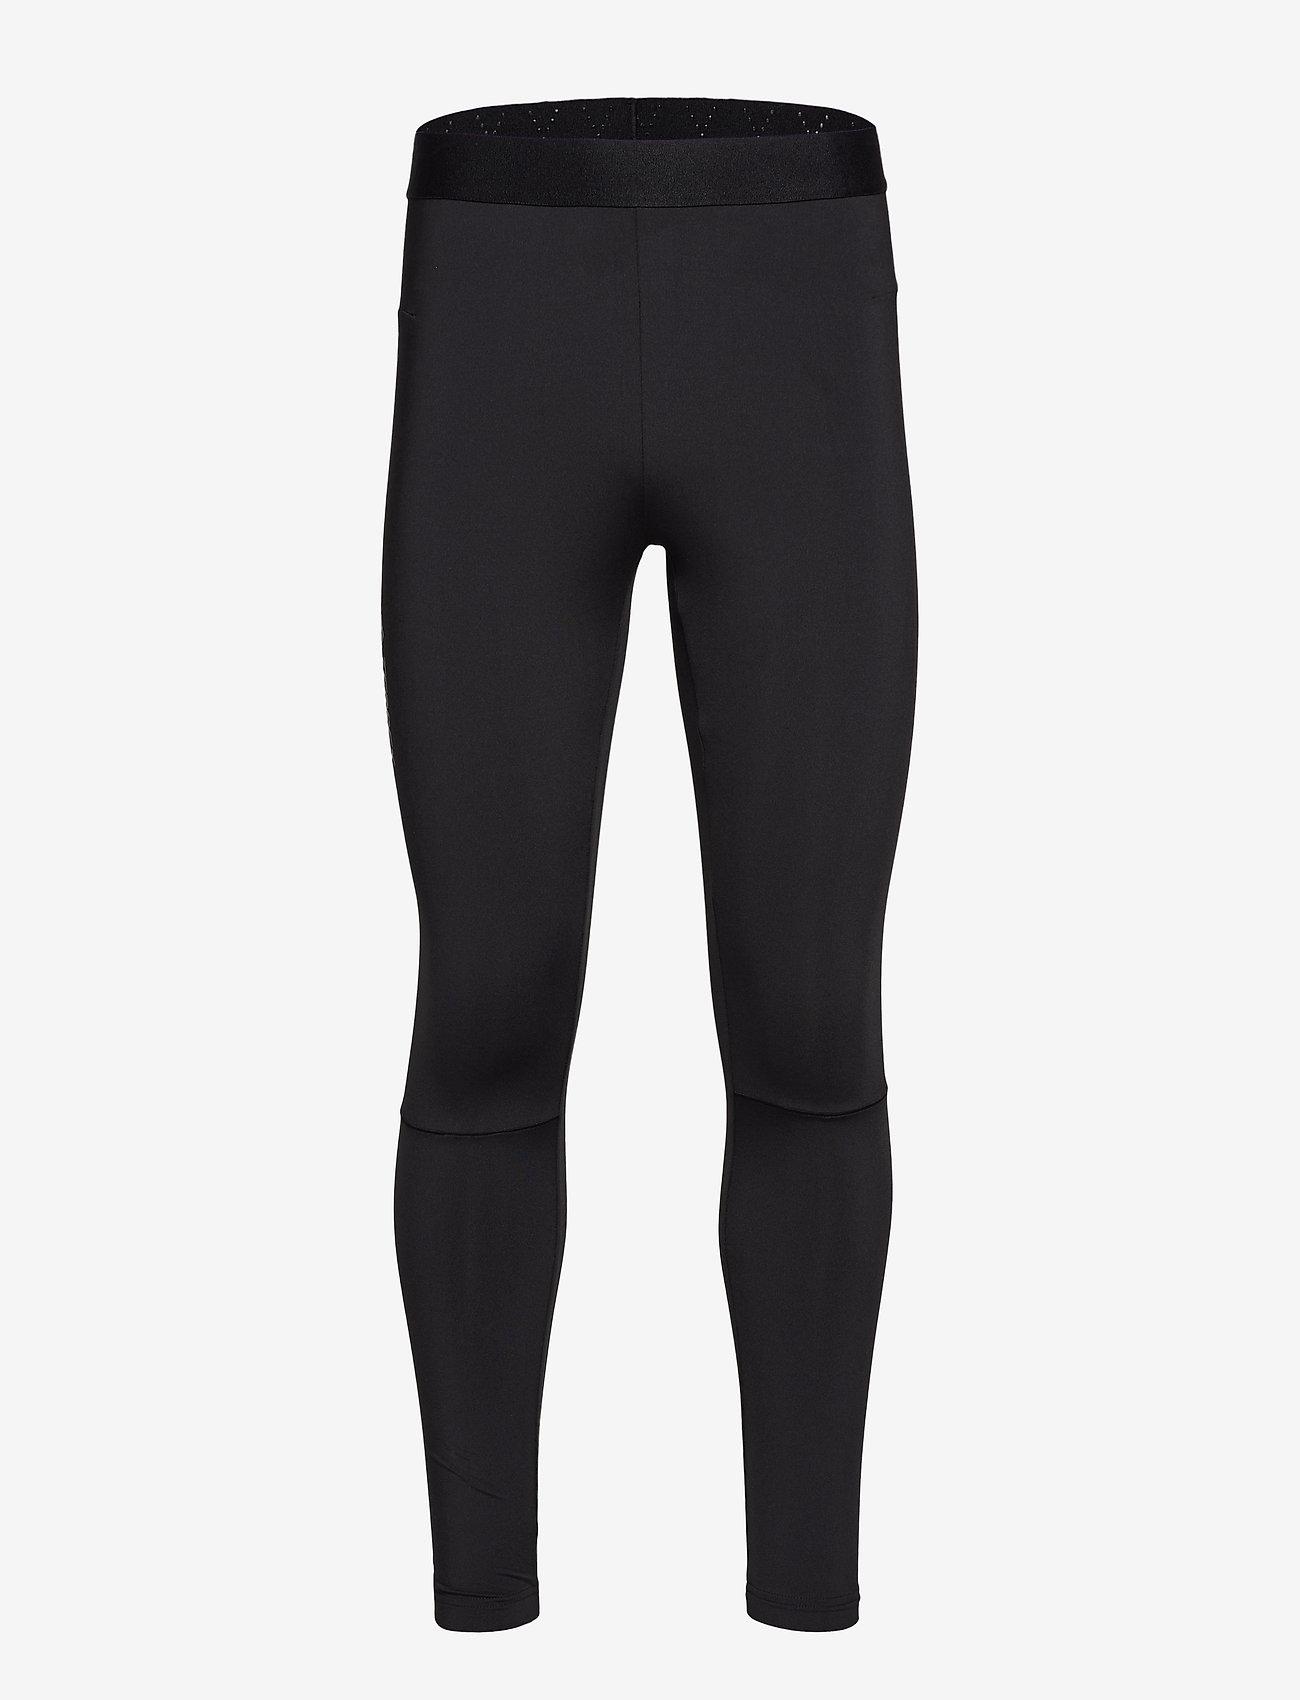 adidas Performance - Xpr Tights M - running & training tights - black - 1